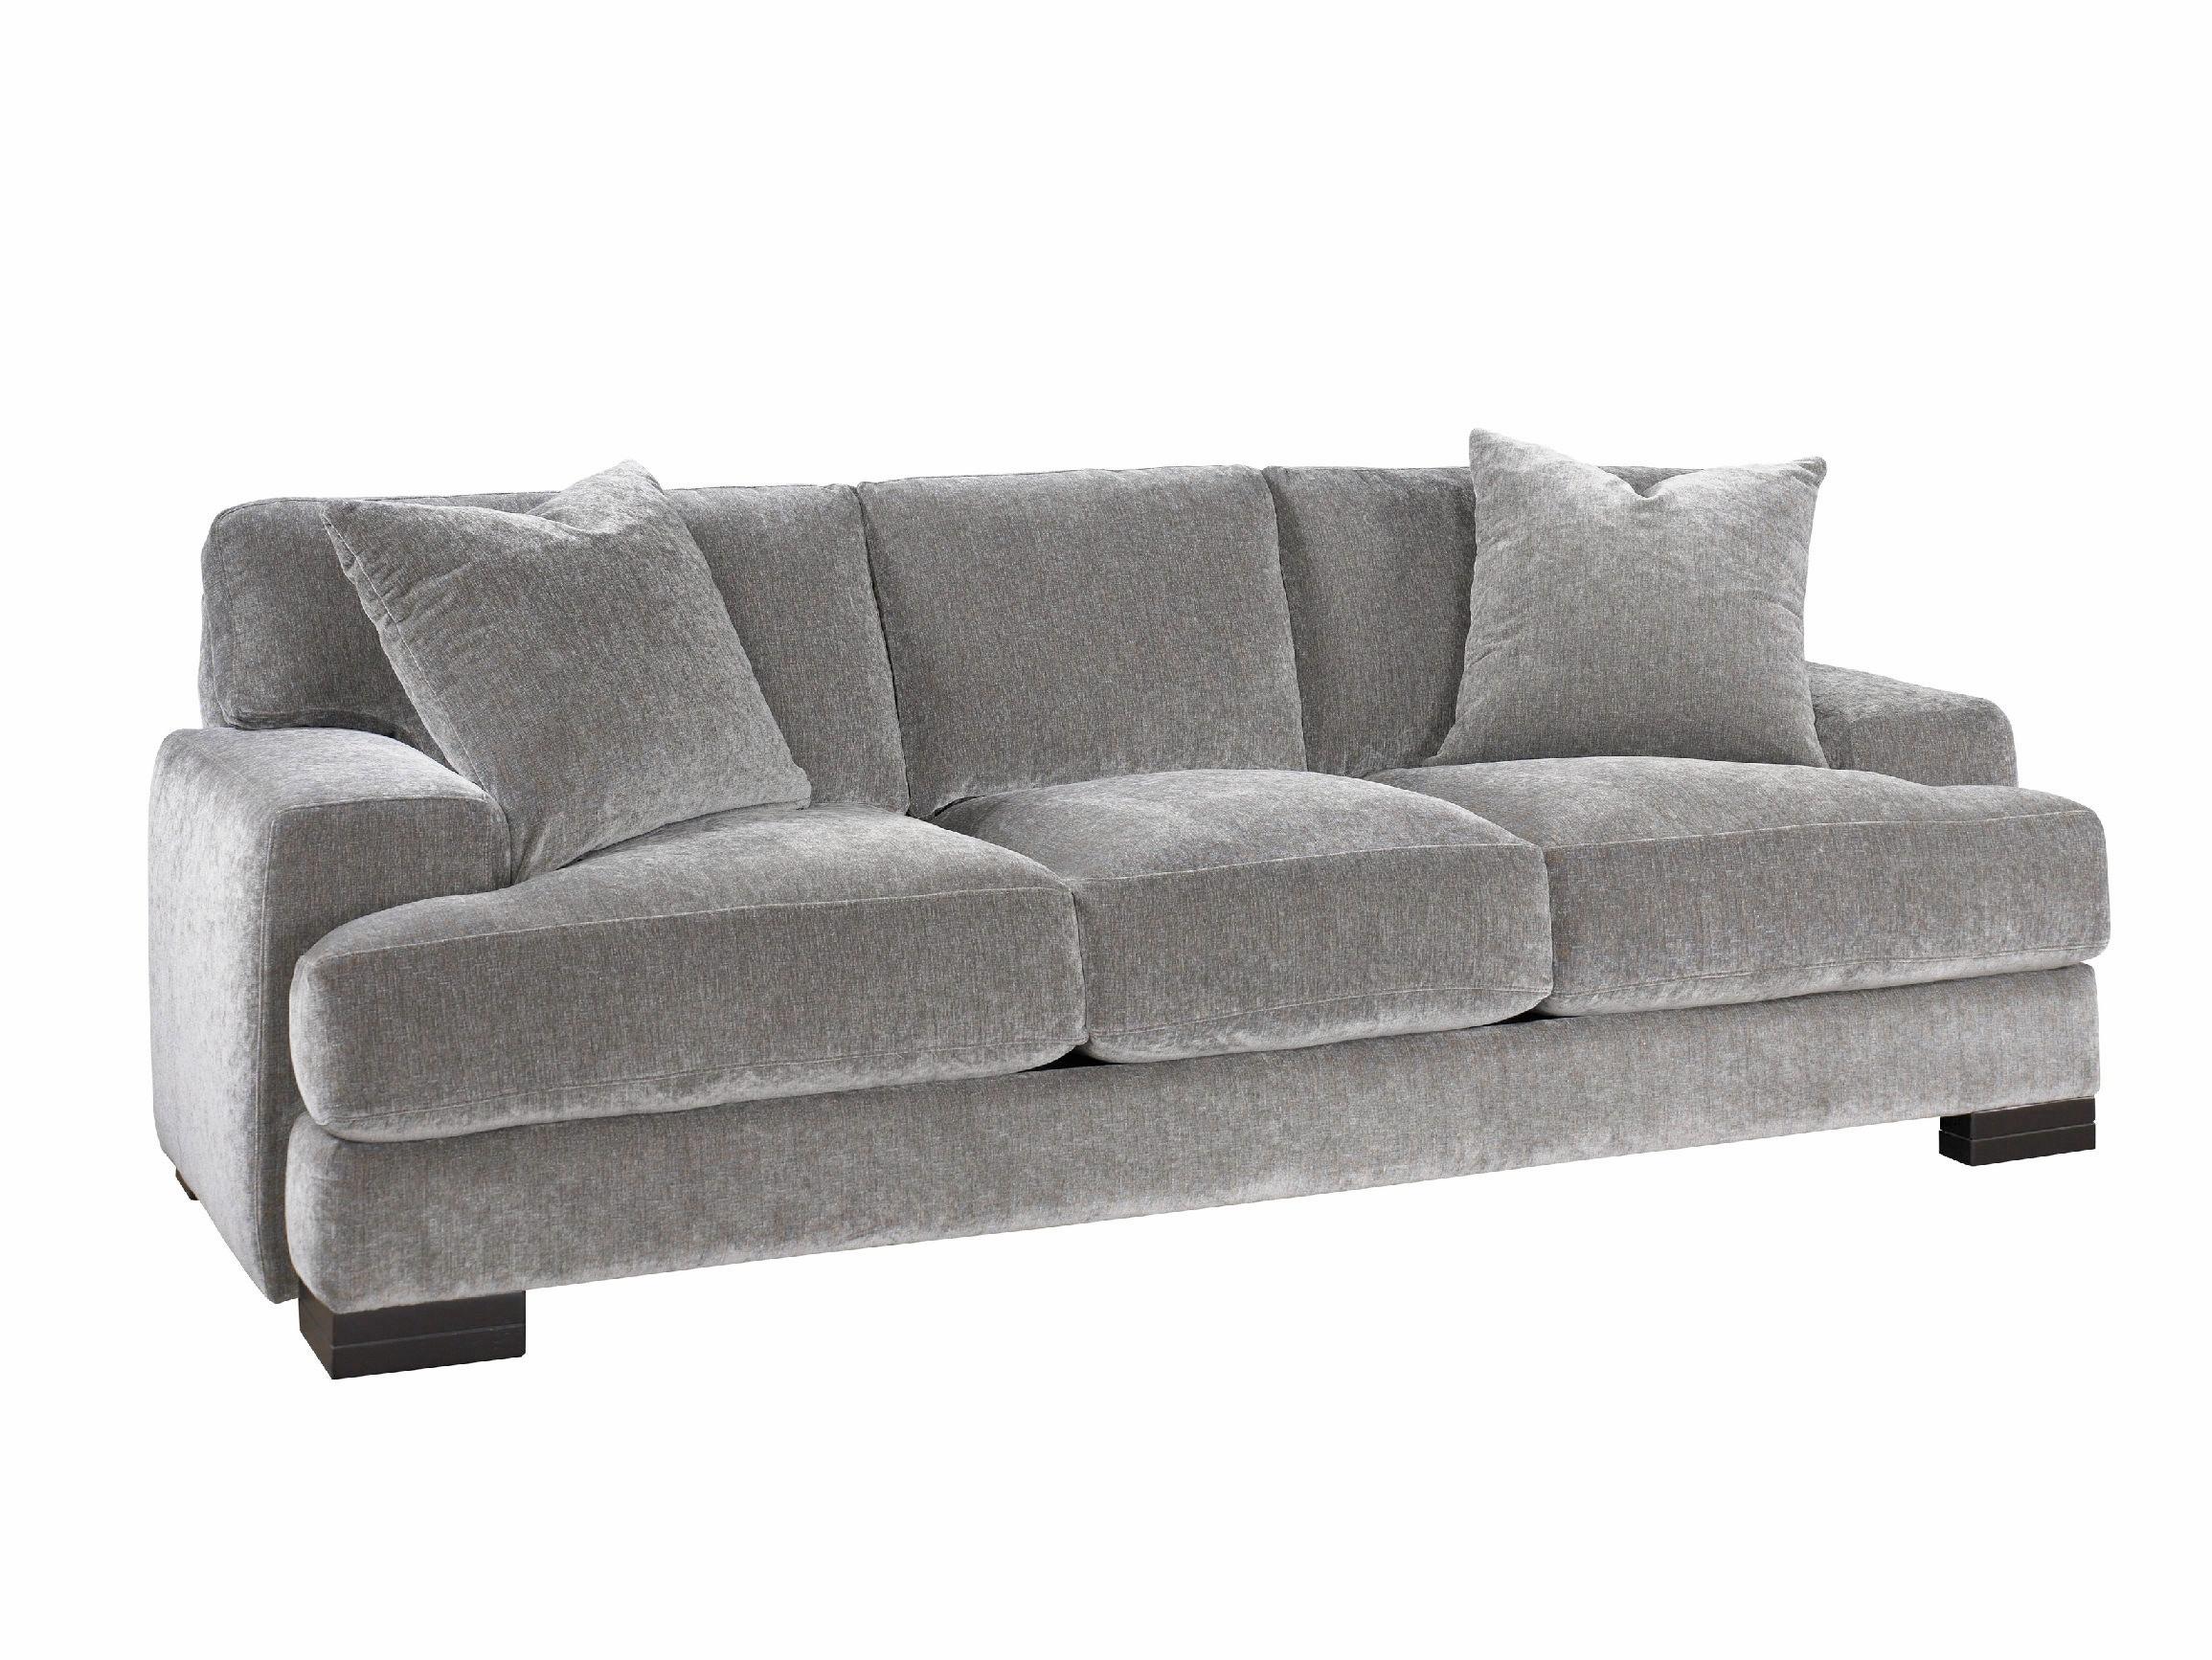 Carol House Furniture